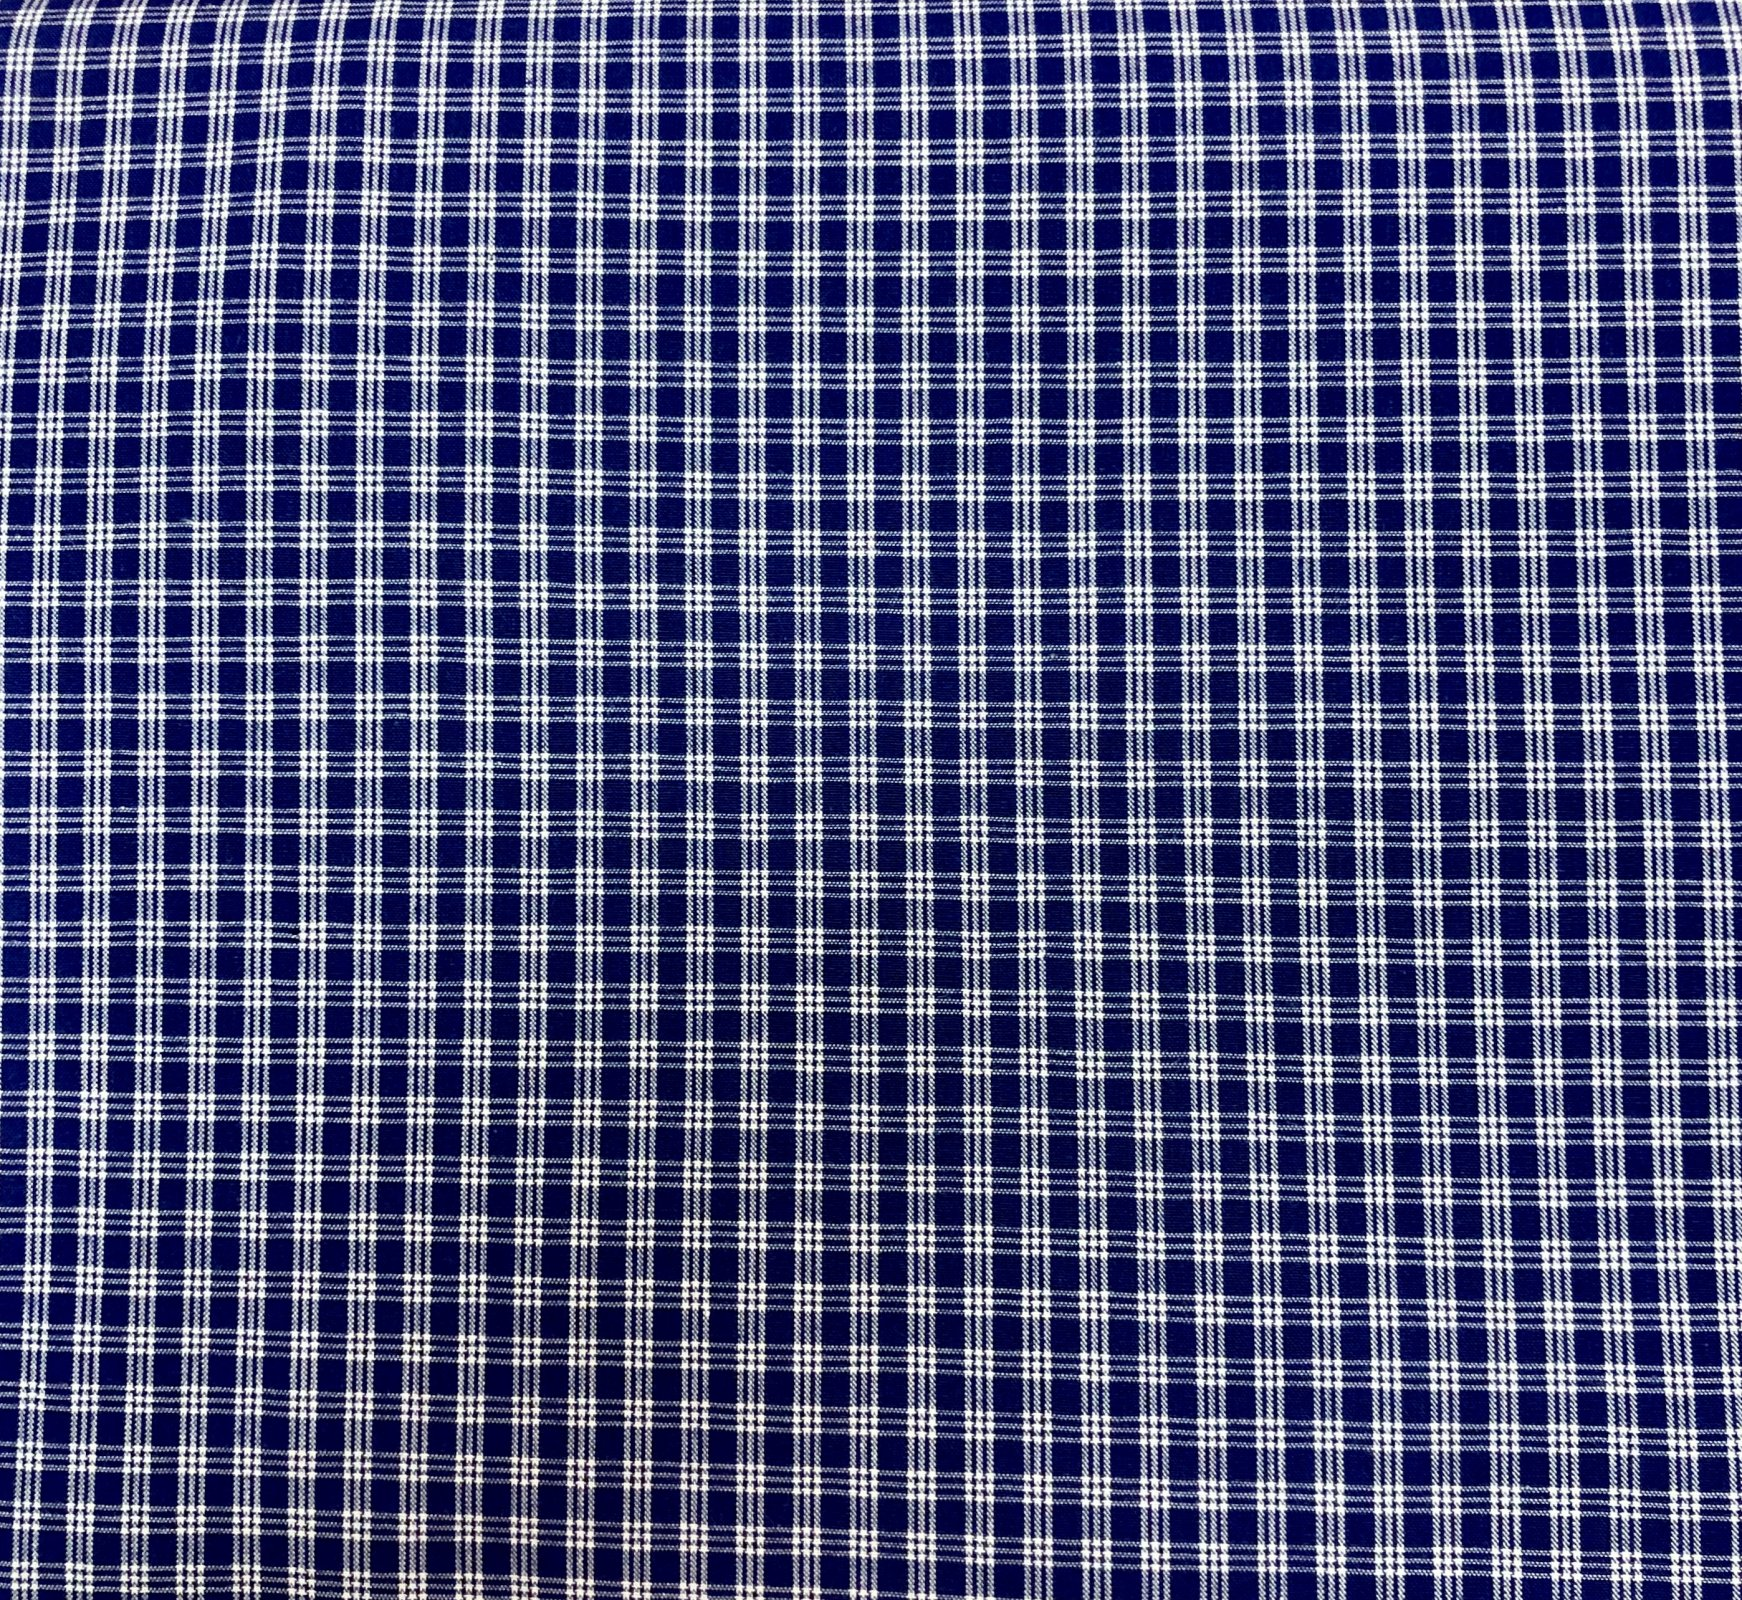 Spechler Vogel - Pastel classic Royal Blue